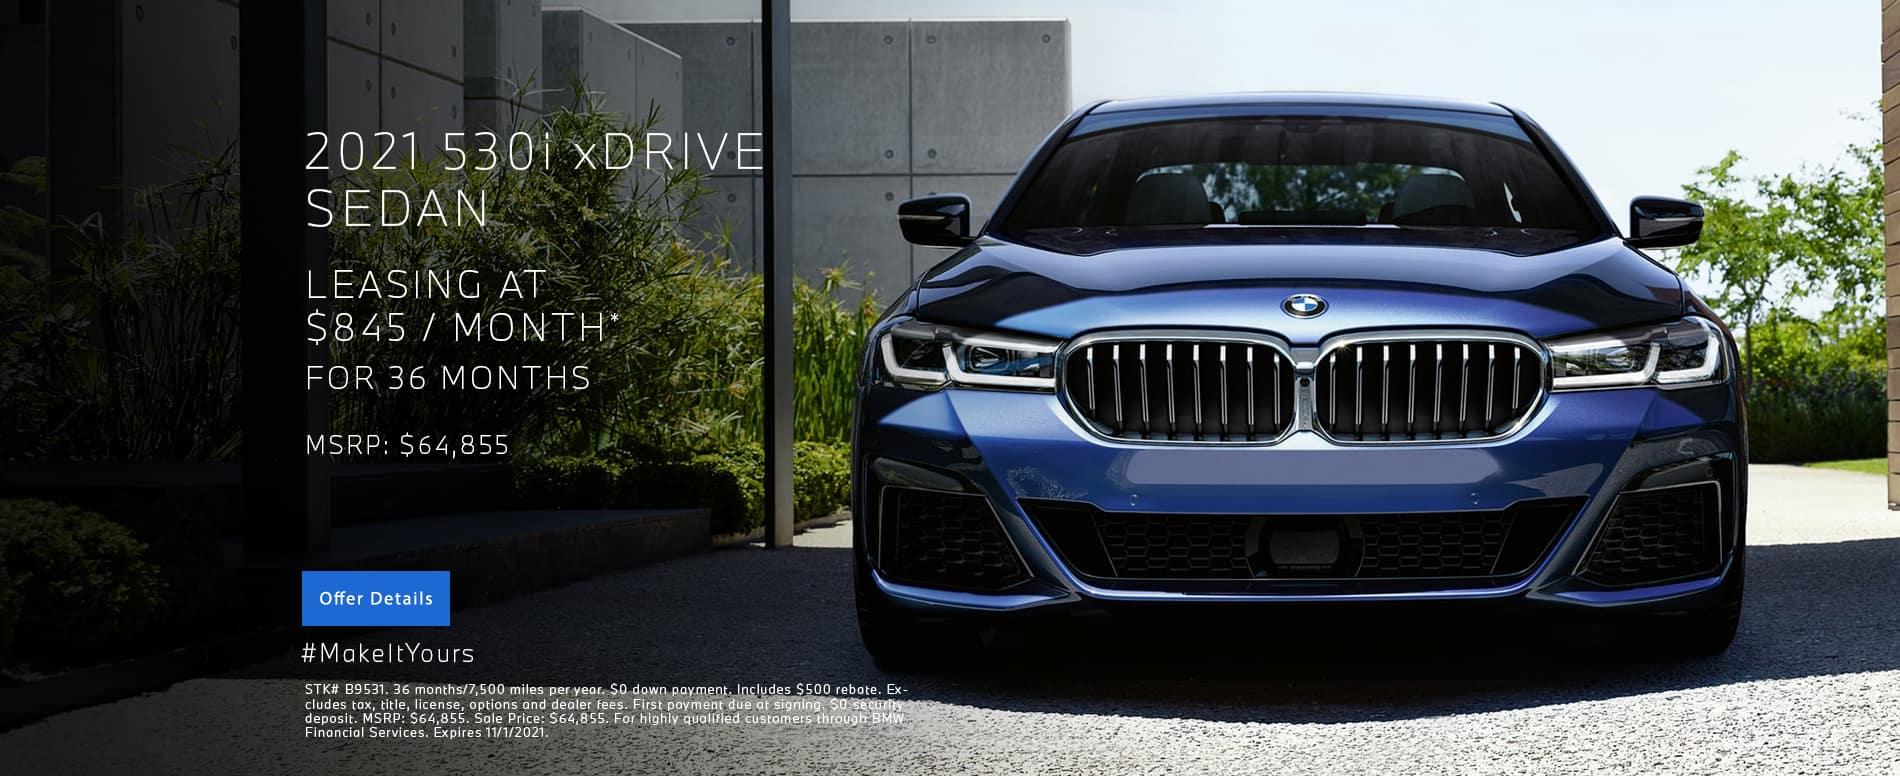 New 530i XDrive Lease | BMW Minnetonka